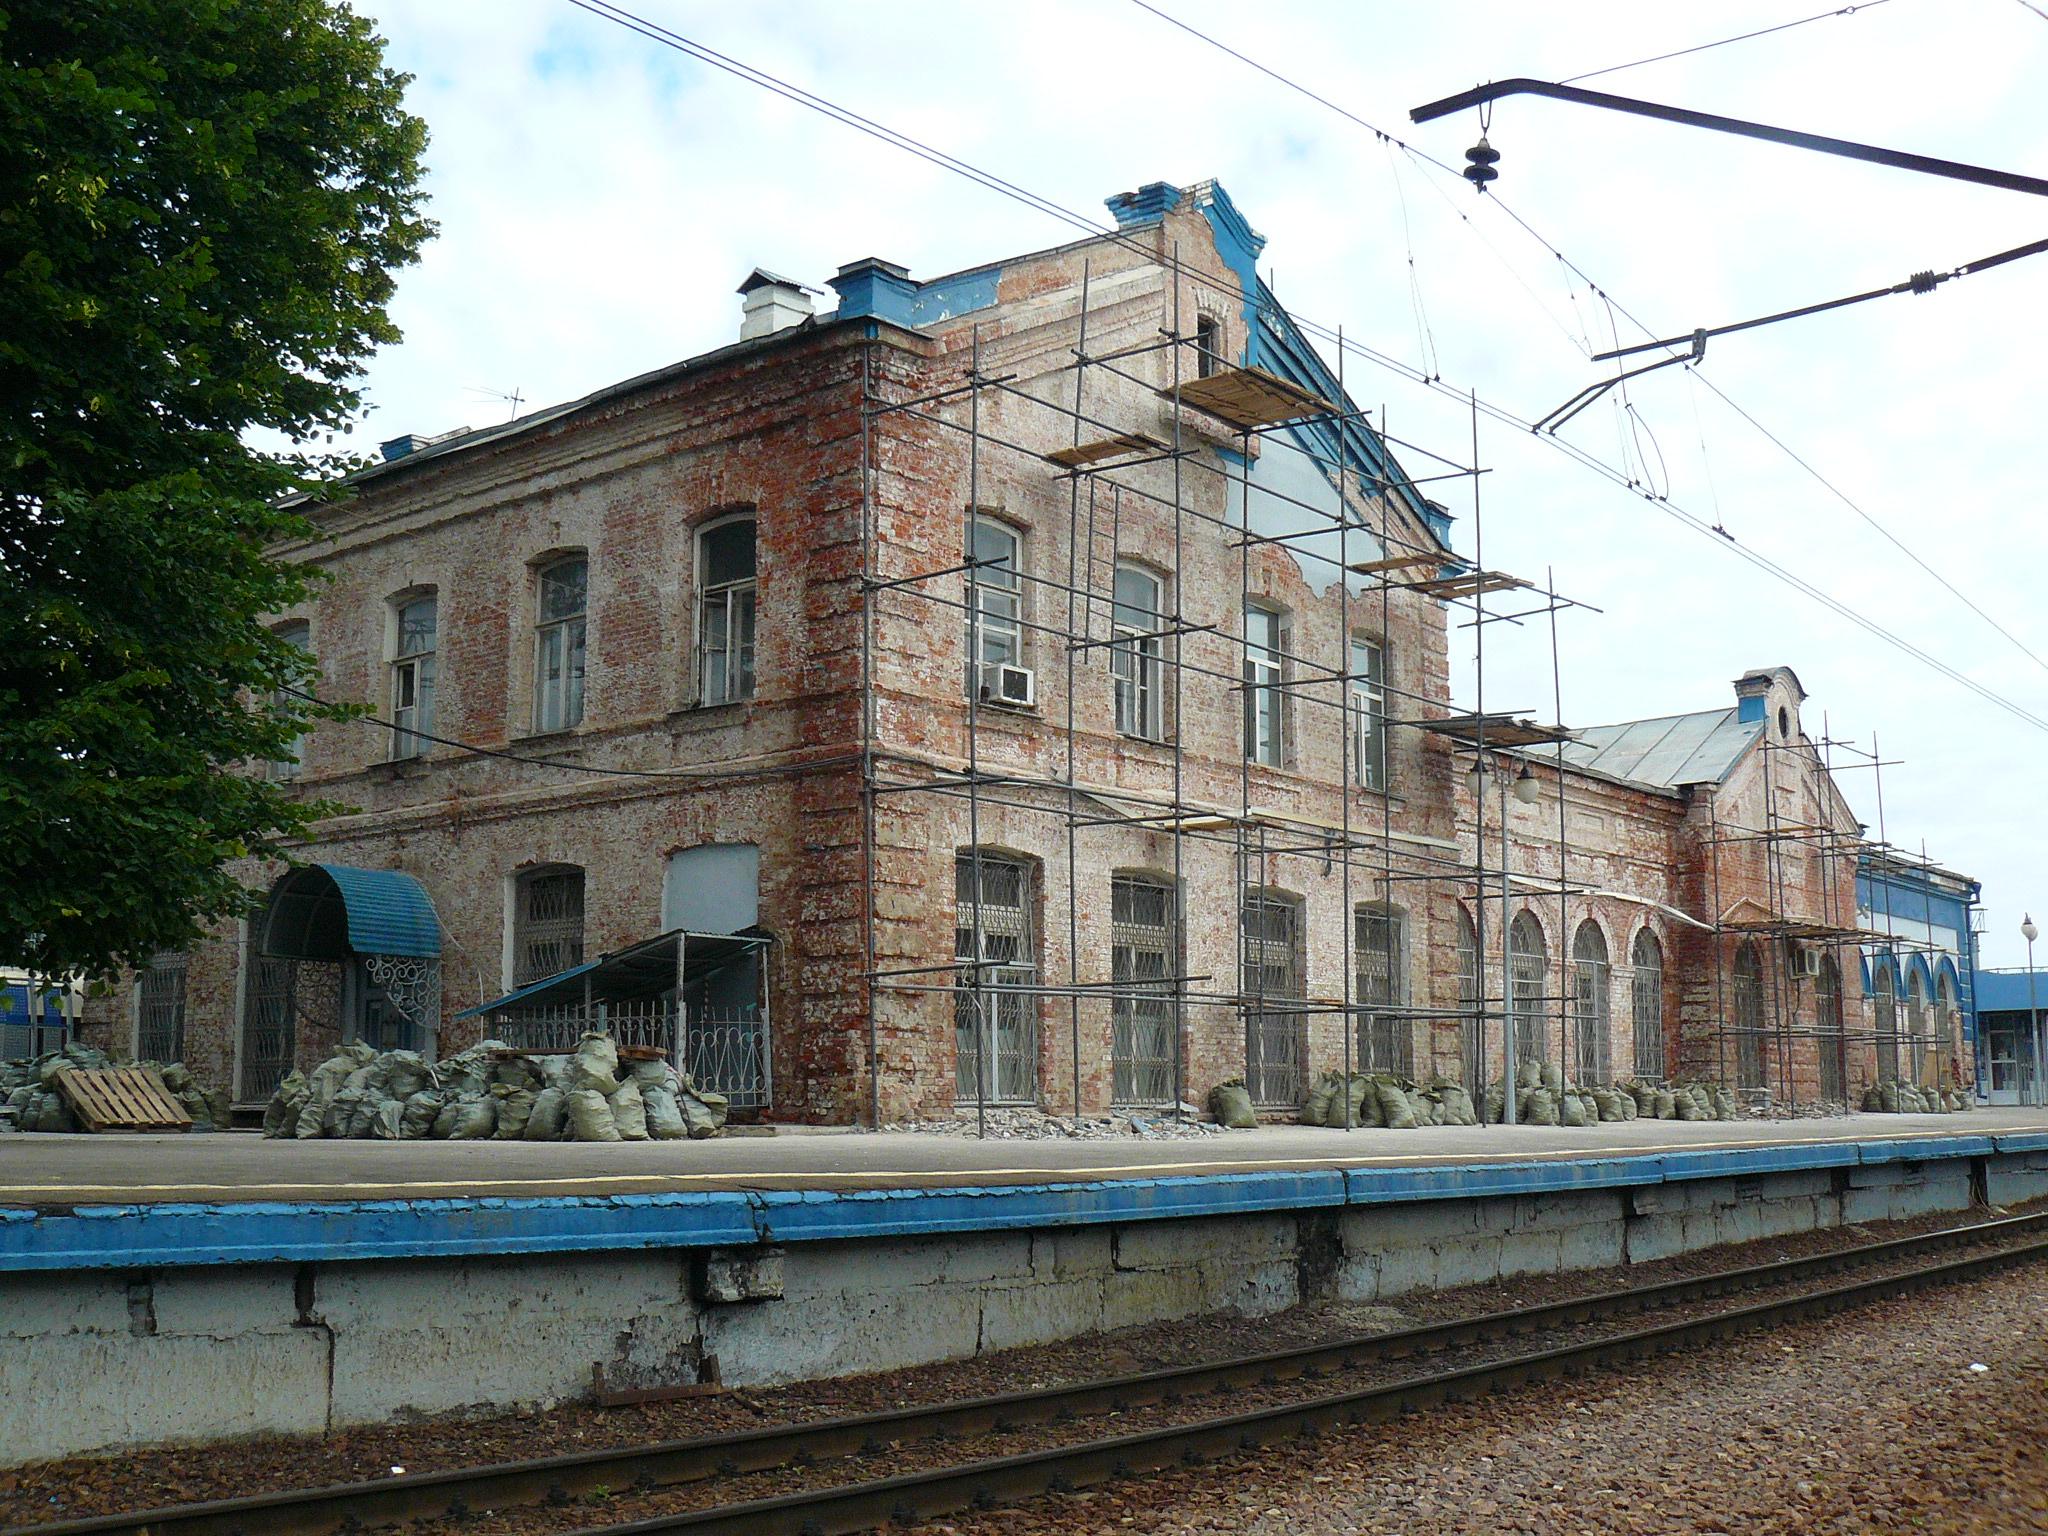 http://pics.livejournal.com/pushkino_2009/pic/000z2sxy